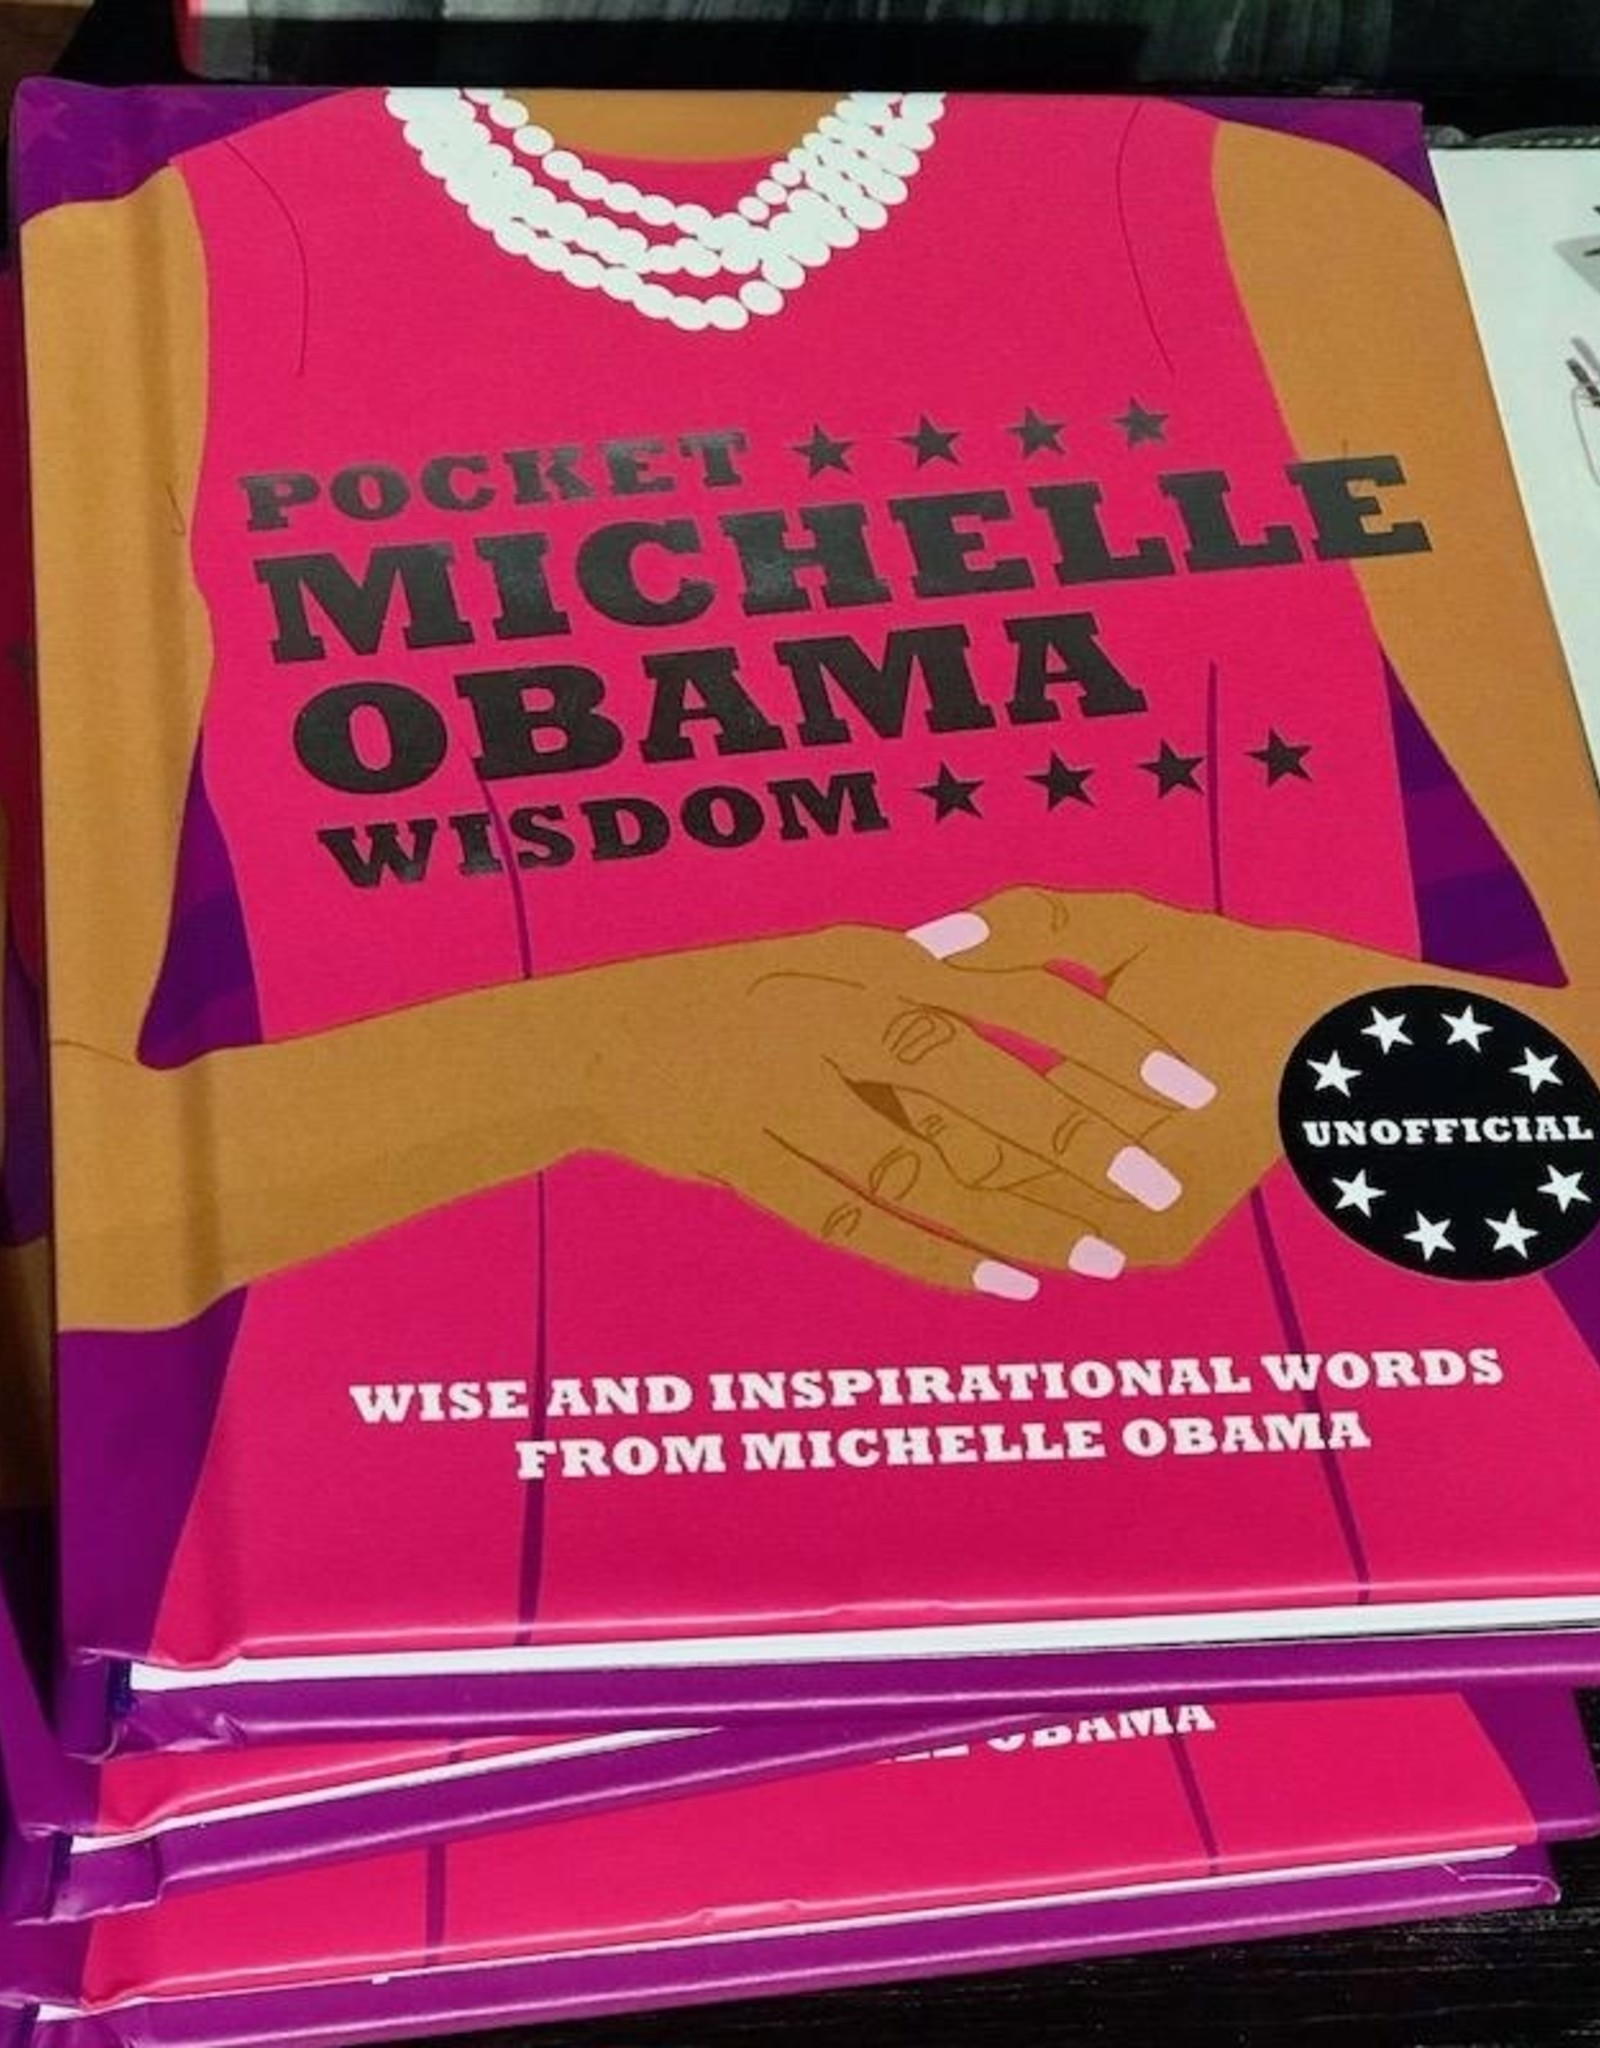 Pocket Michelle Obama Wisdom